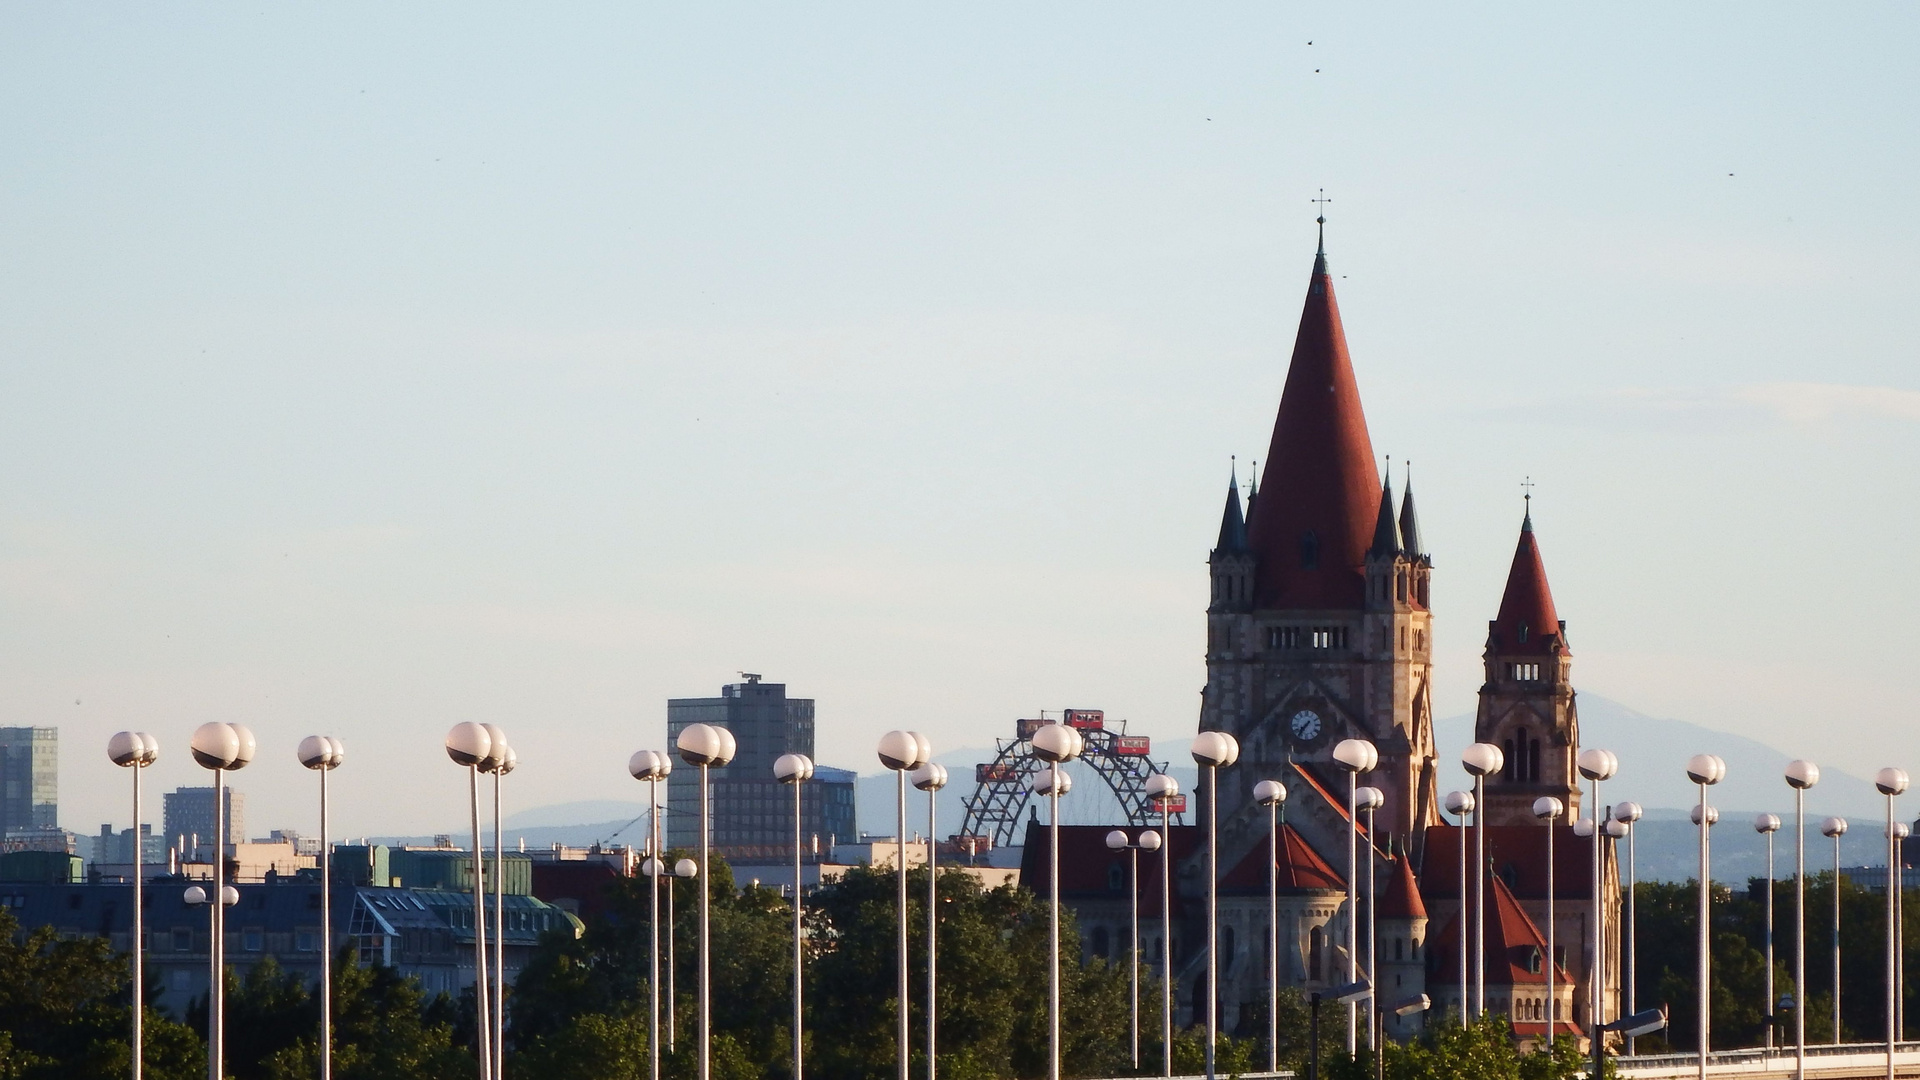 Stadtpanorama im Lampenspalier